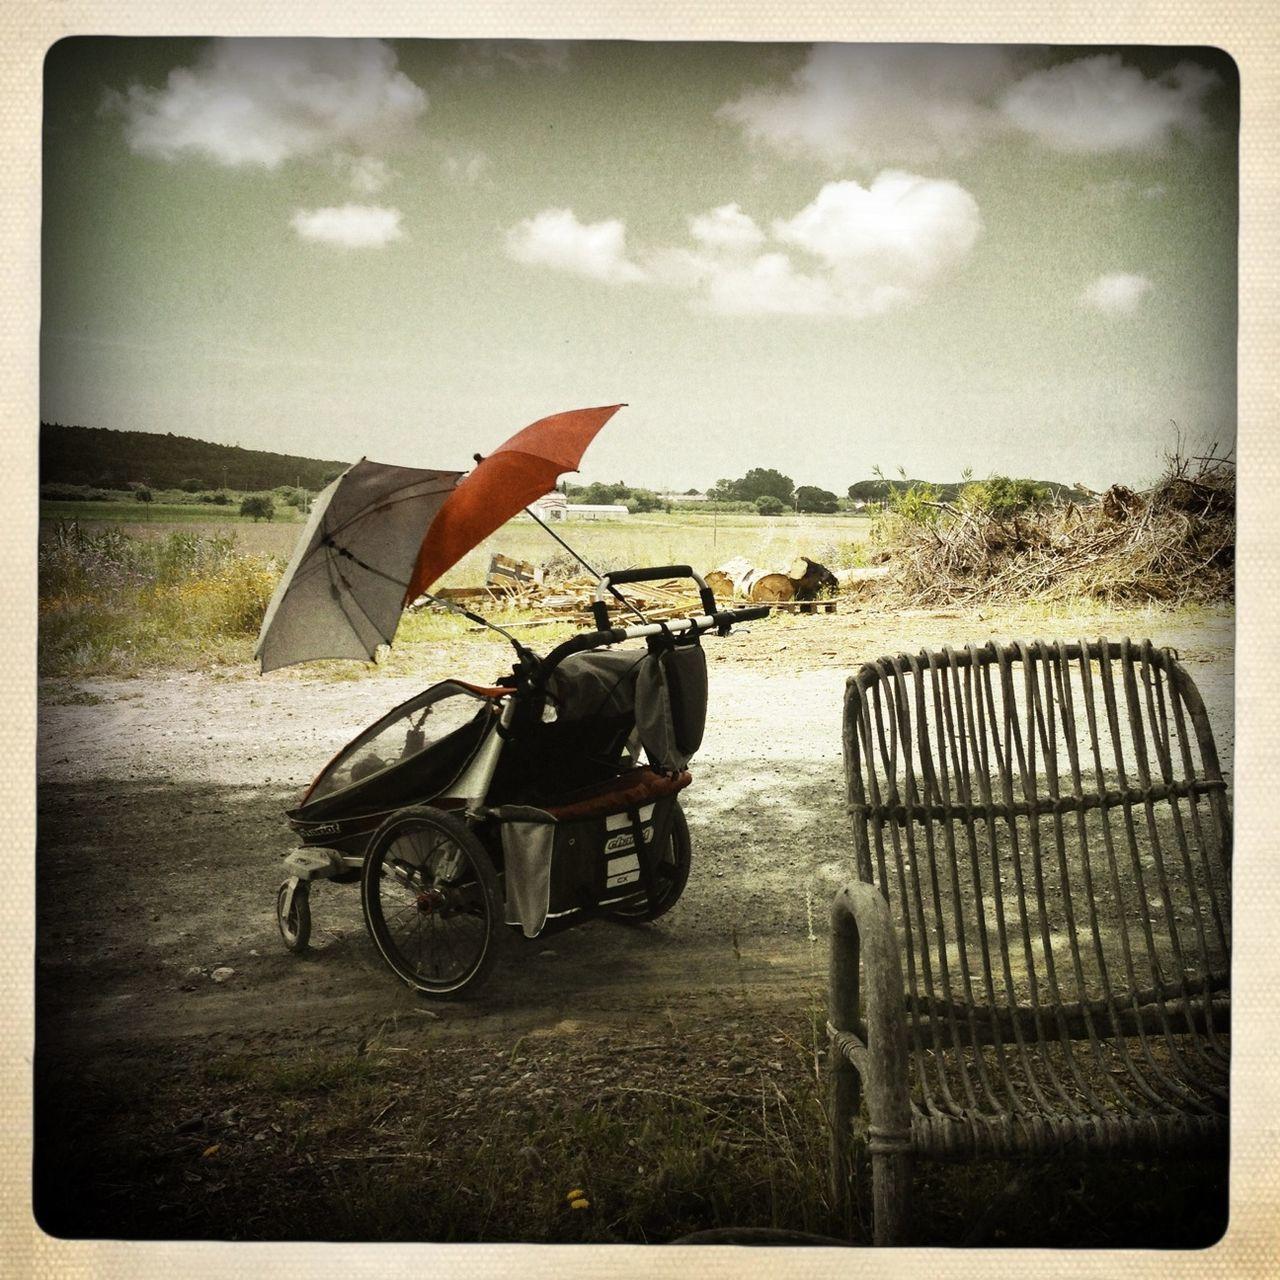 Wheelchair With Umbrella Against Sky